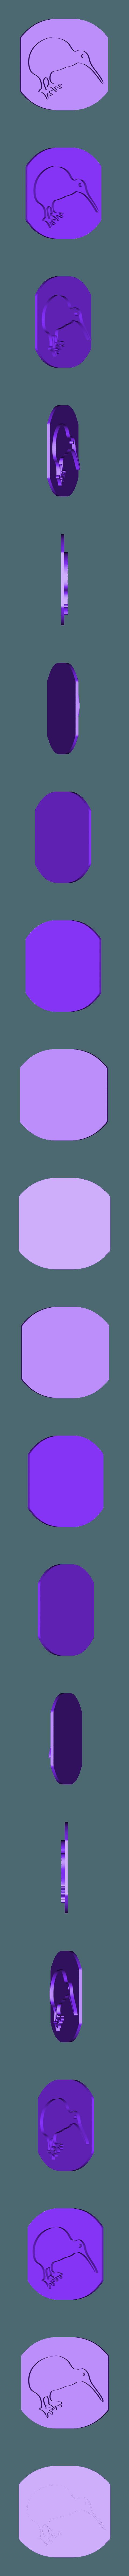 kiwi_toast_2.stl Download free STL file Kiwi Toast! • 3D printing template, Palasestia